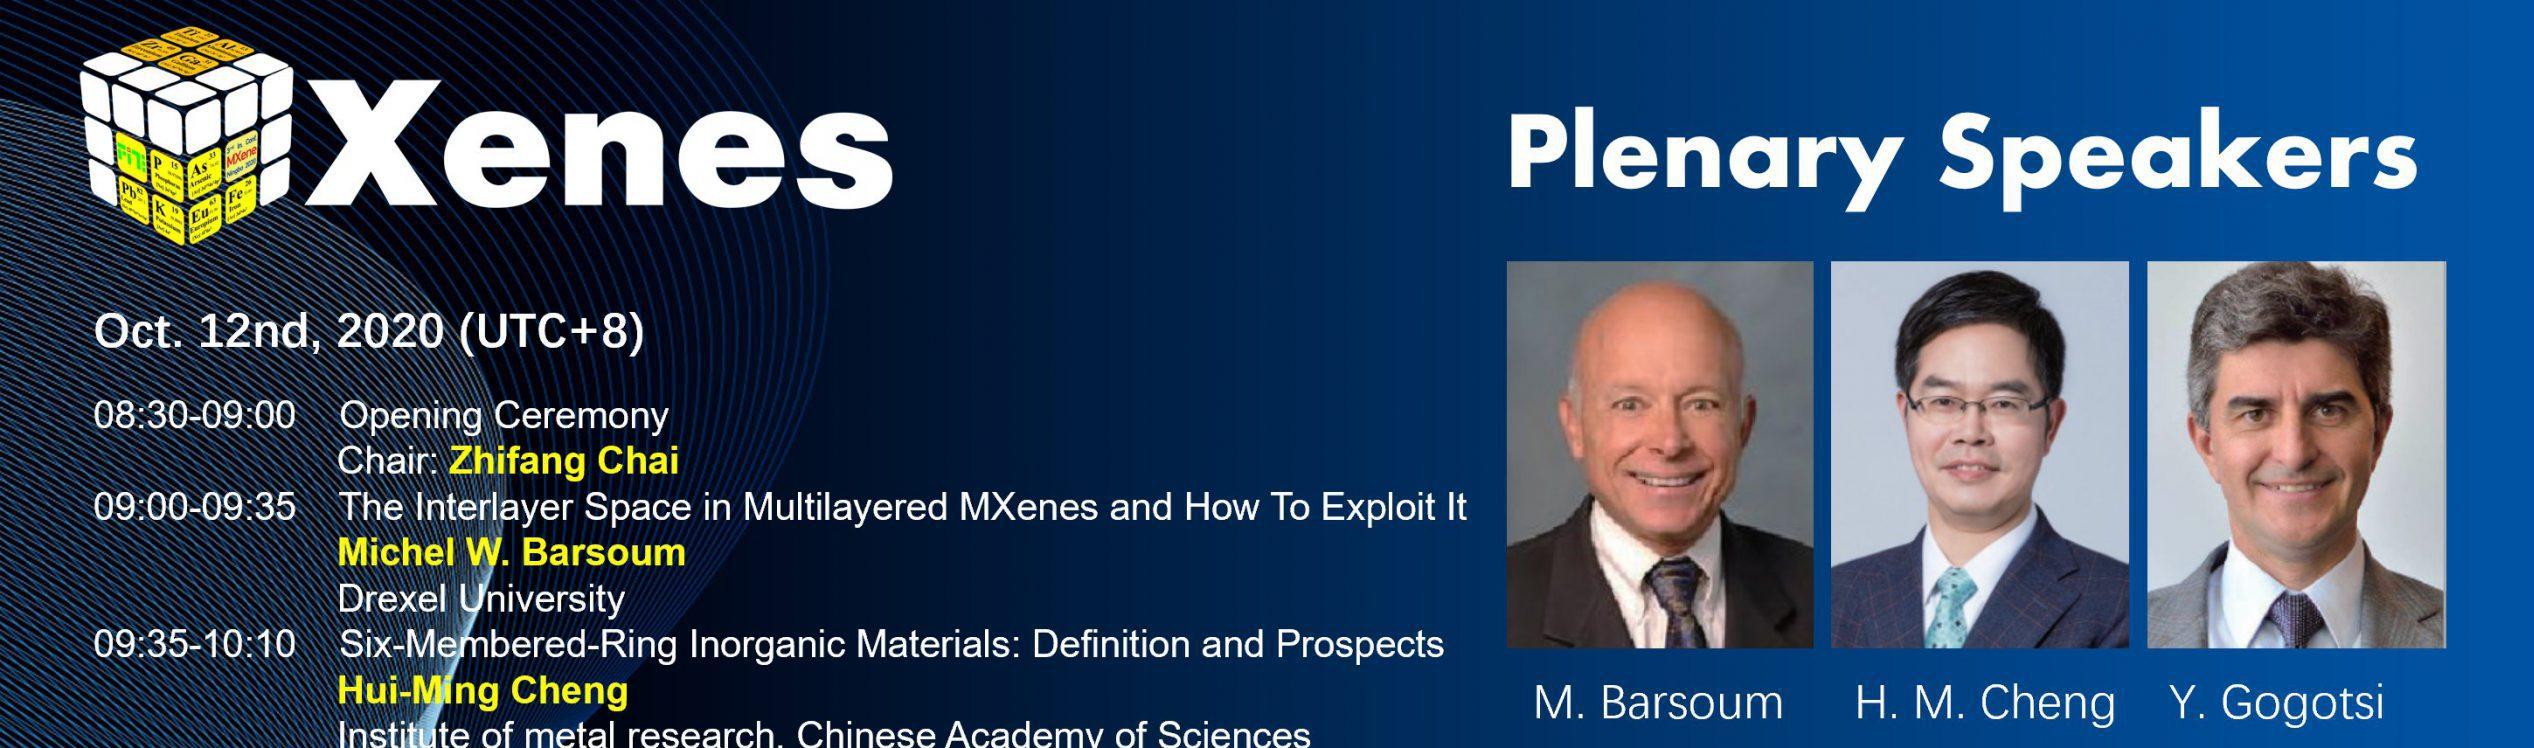 Prof. Gogotsi and Prof. Barsoum gave Plenary talks in the MXene 2020 conference